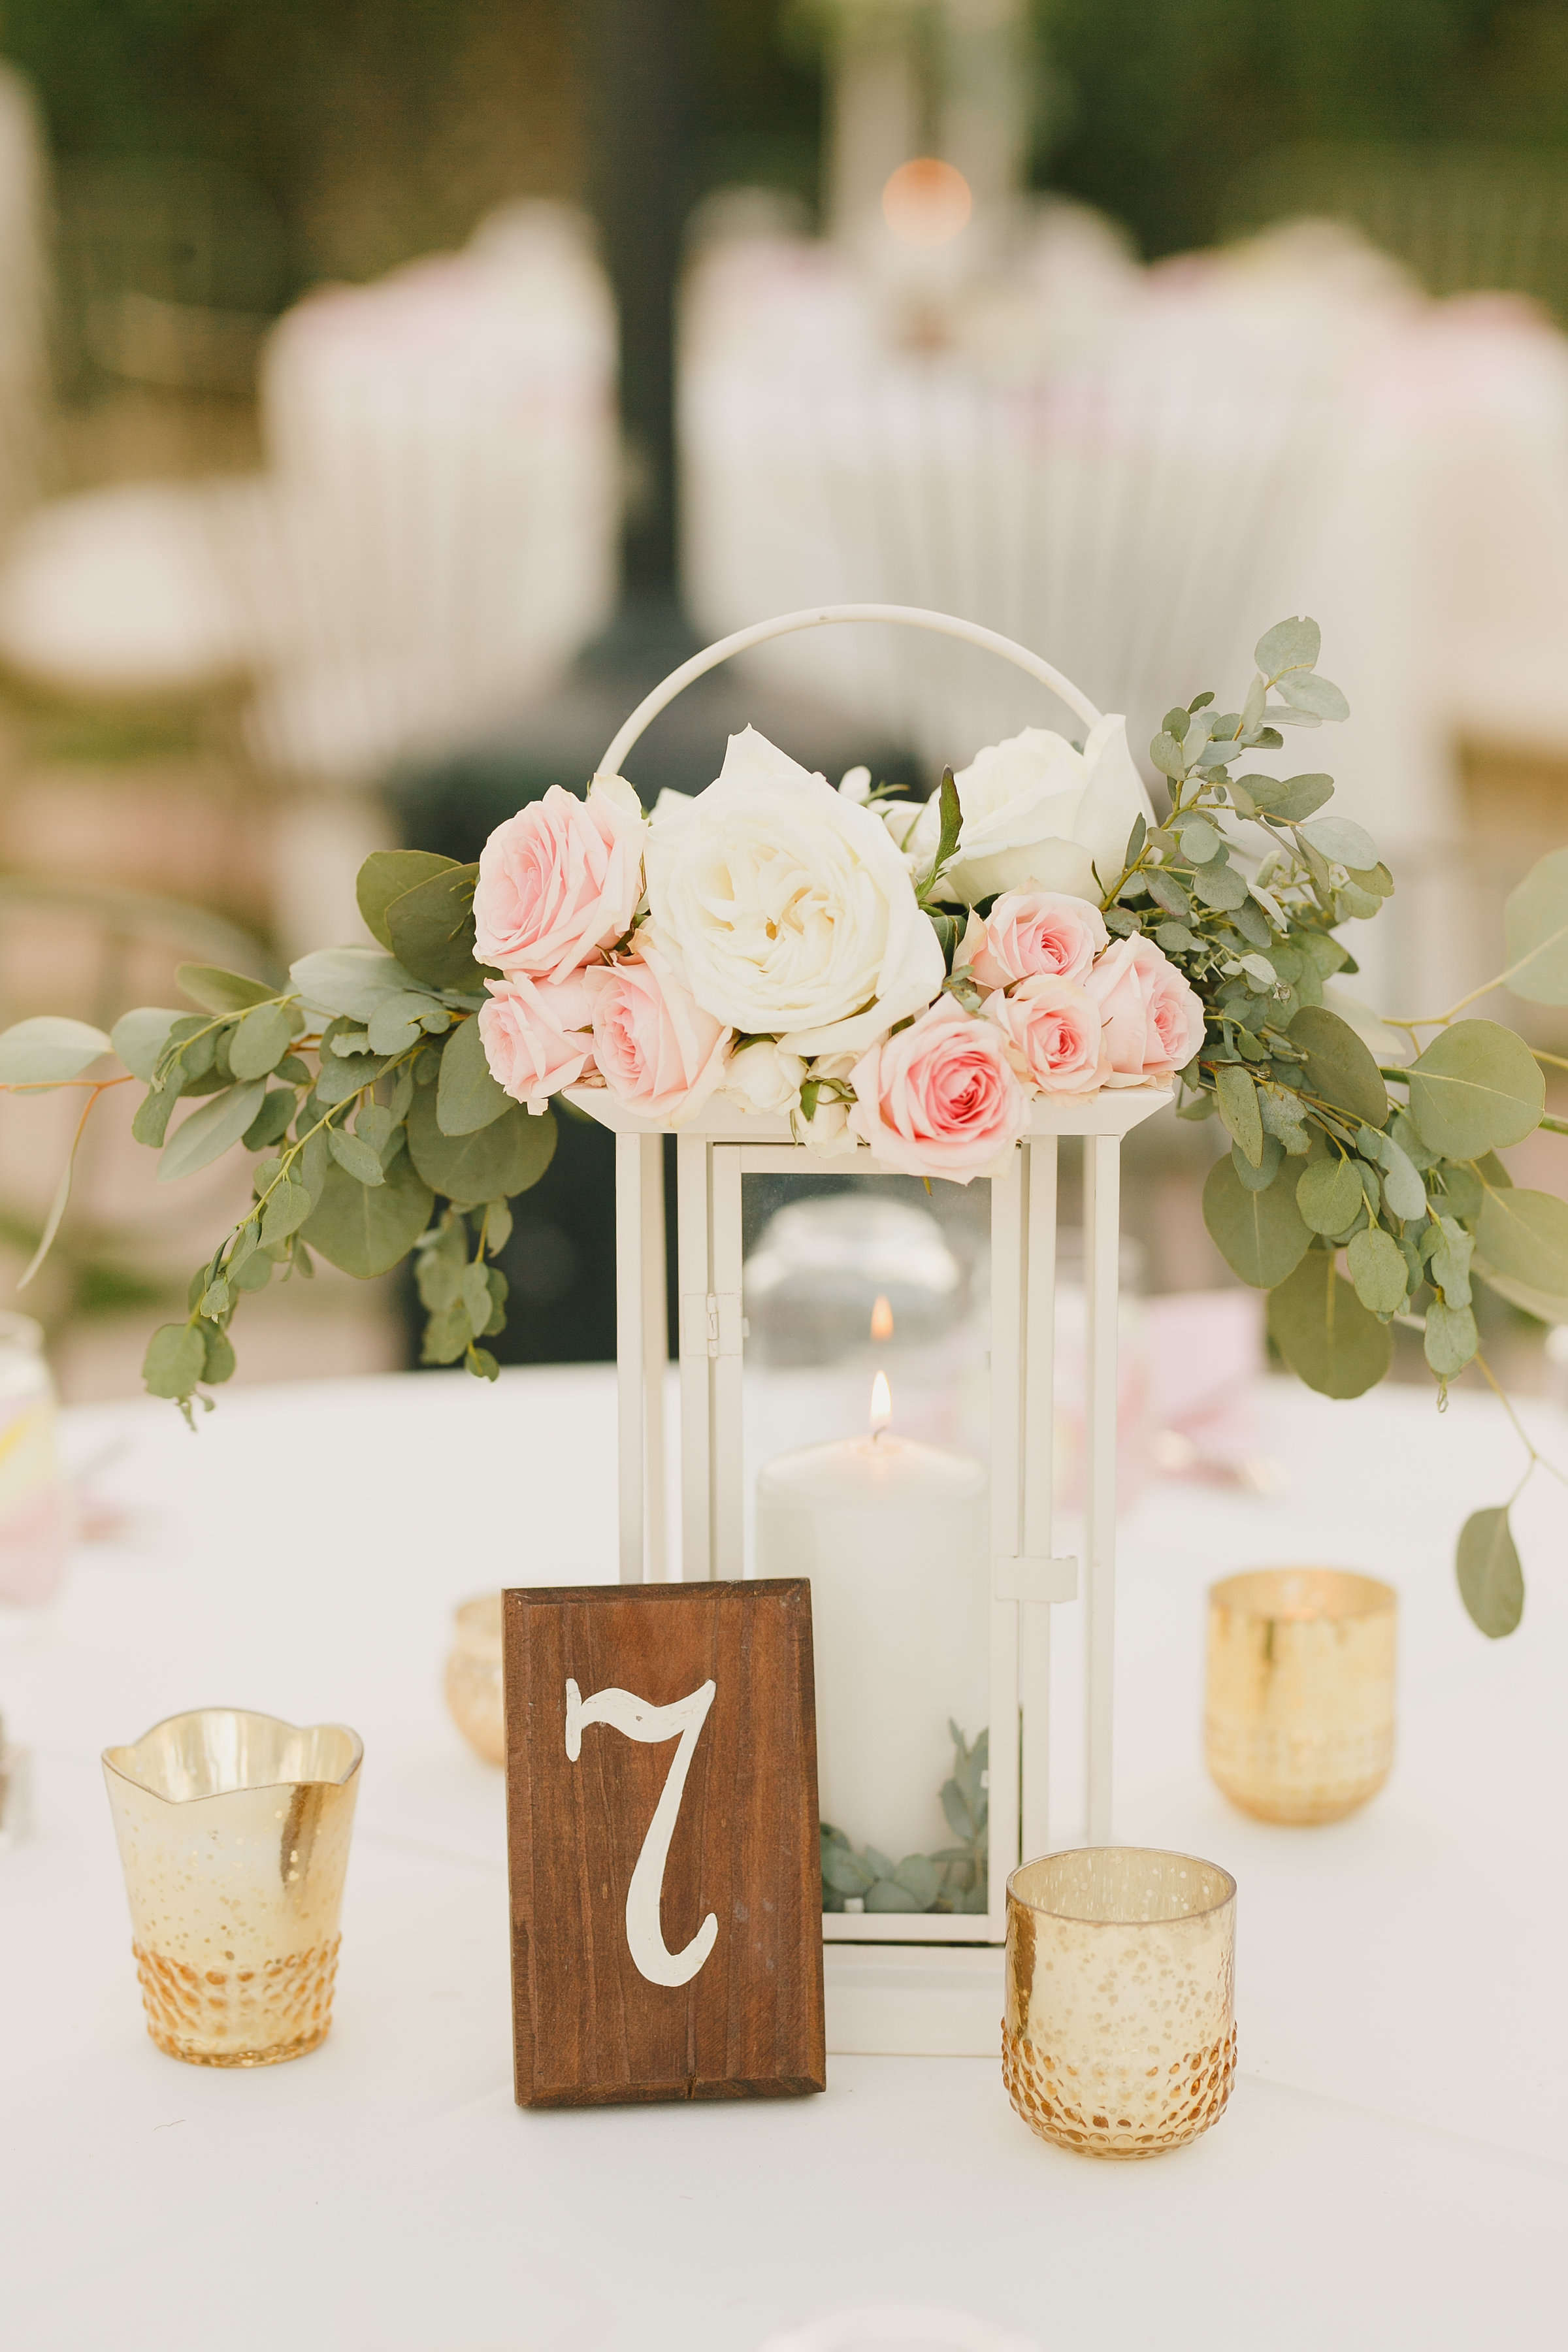 www.santabarbarawedding.com | Kristen Booth Photography | Rincon Beach Club | Reception | Table Number